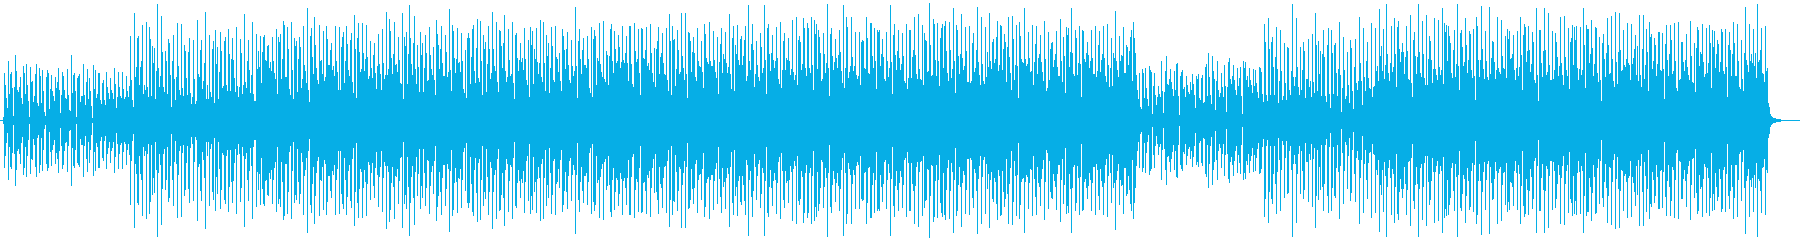 Fun, happiness, lightness, ukulele, whistling's reproduced waveform